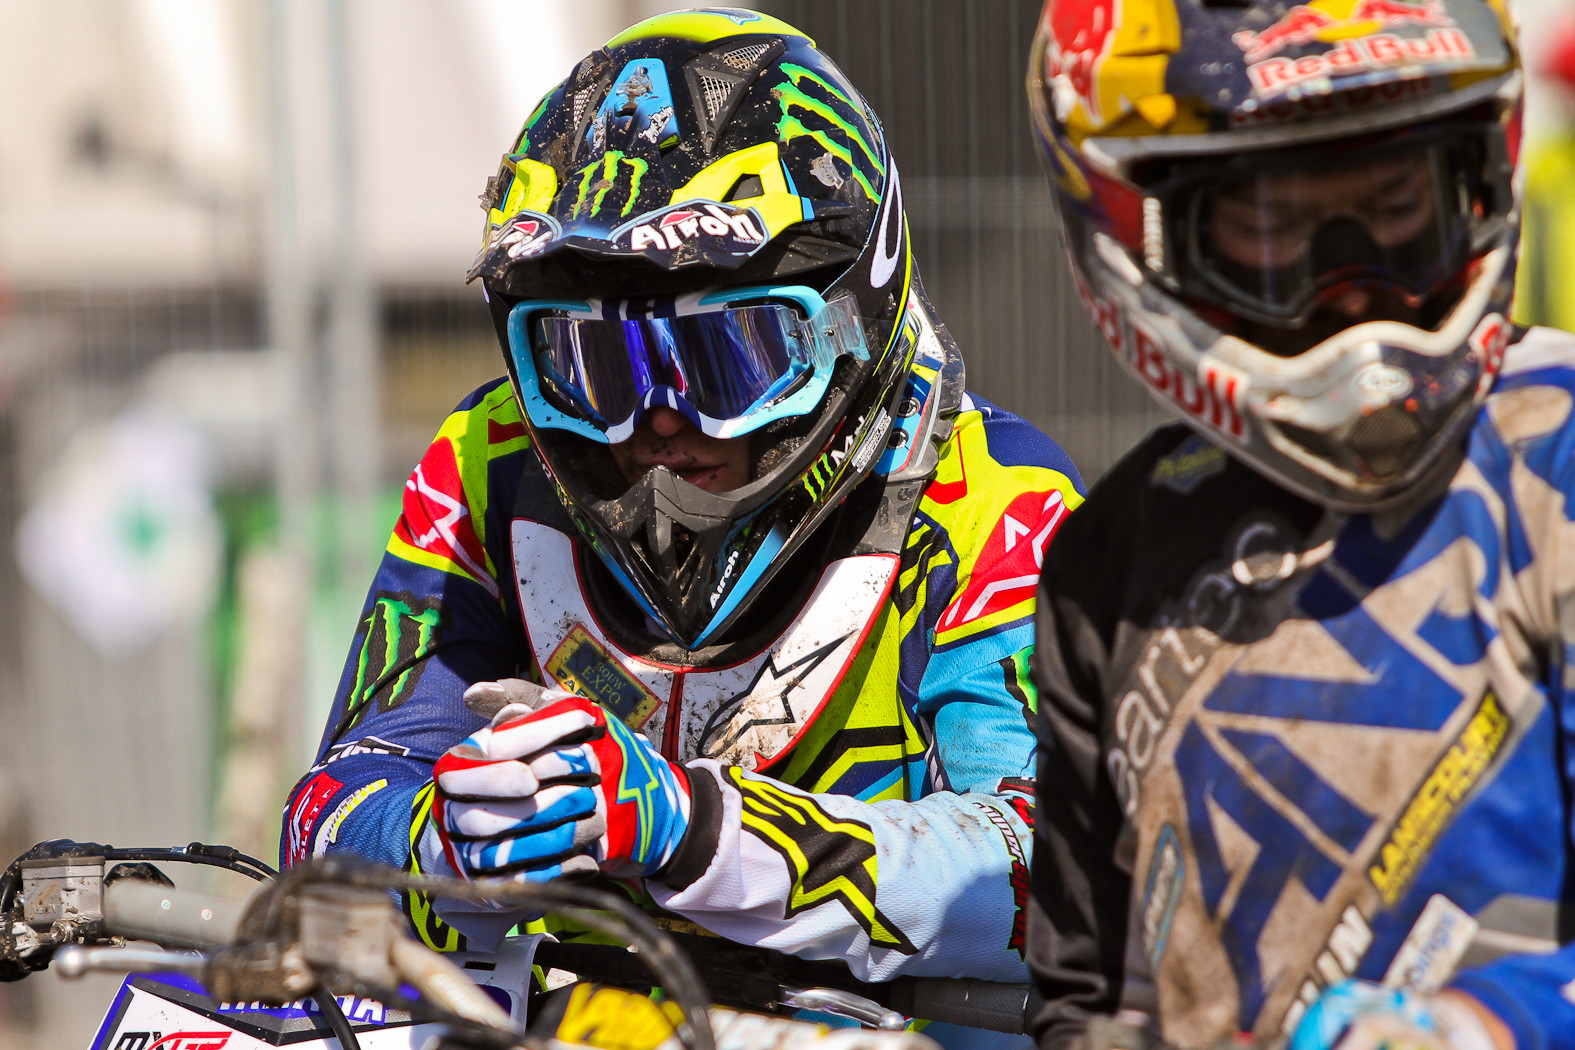 Jeremy van Horebeek - In the Pits: MXGP of Europe - Motocross Pictures - Vital MX